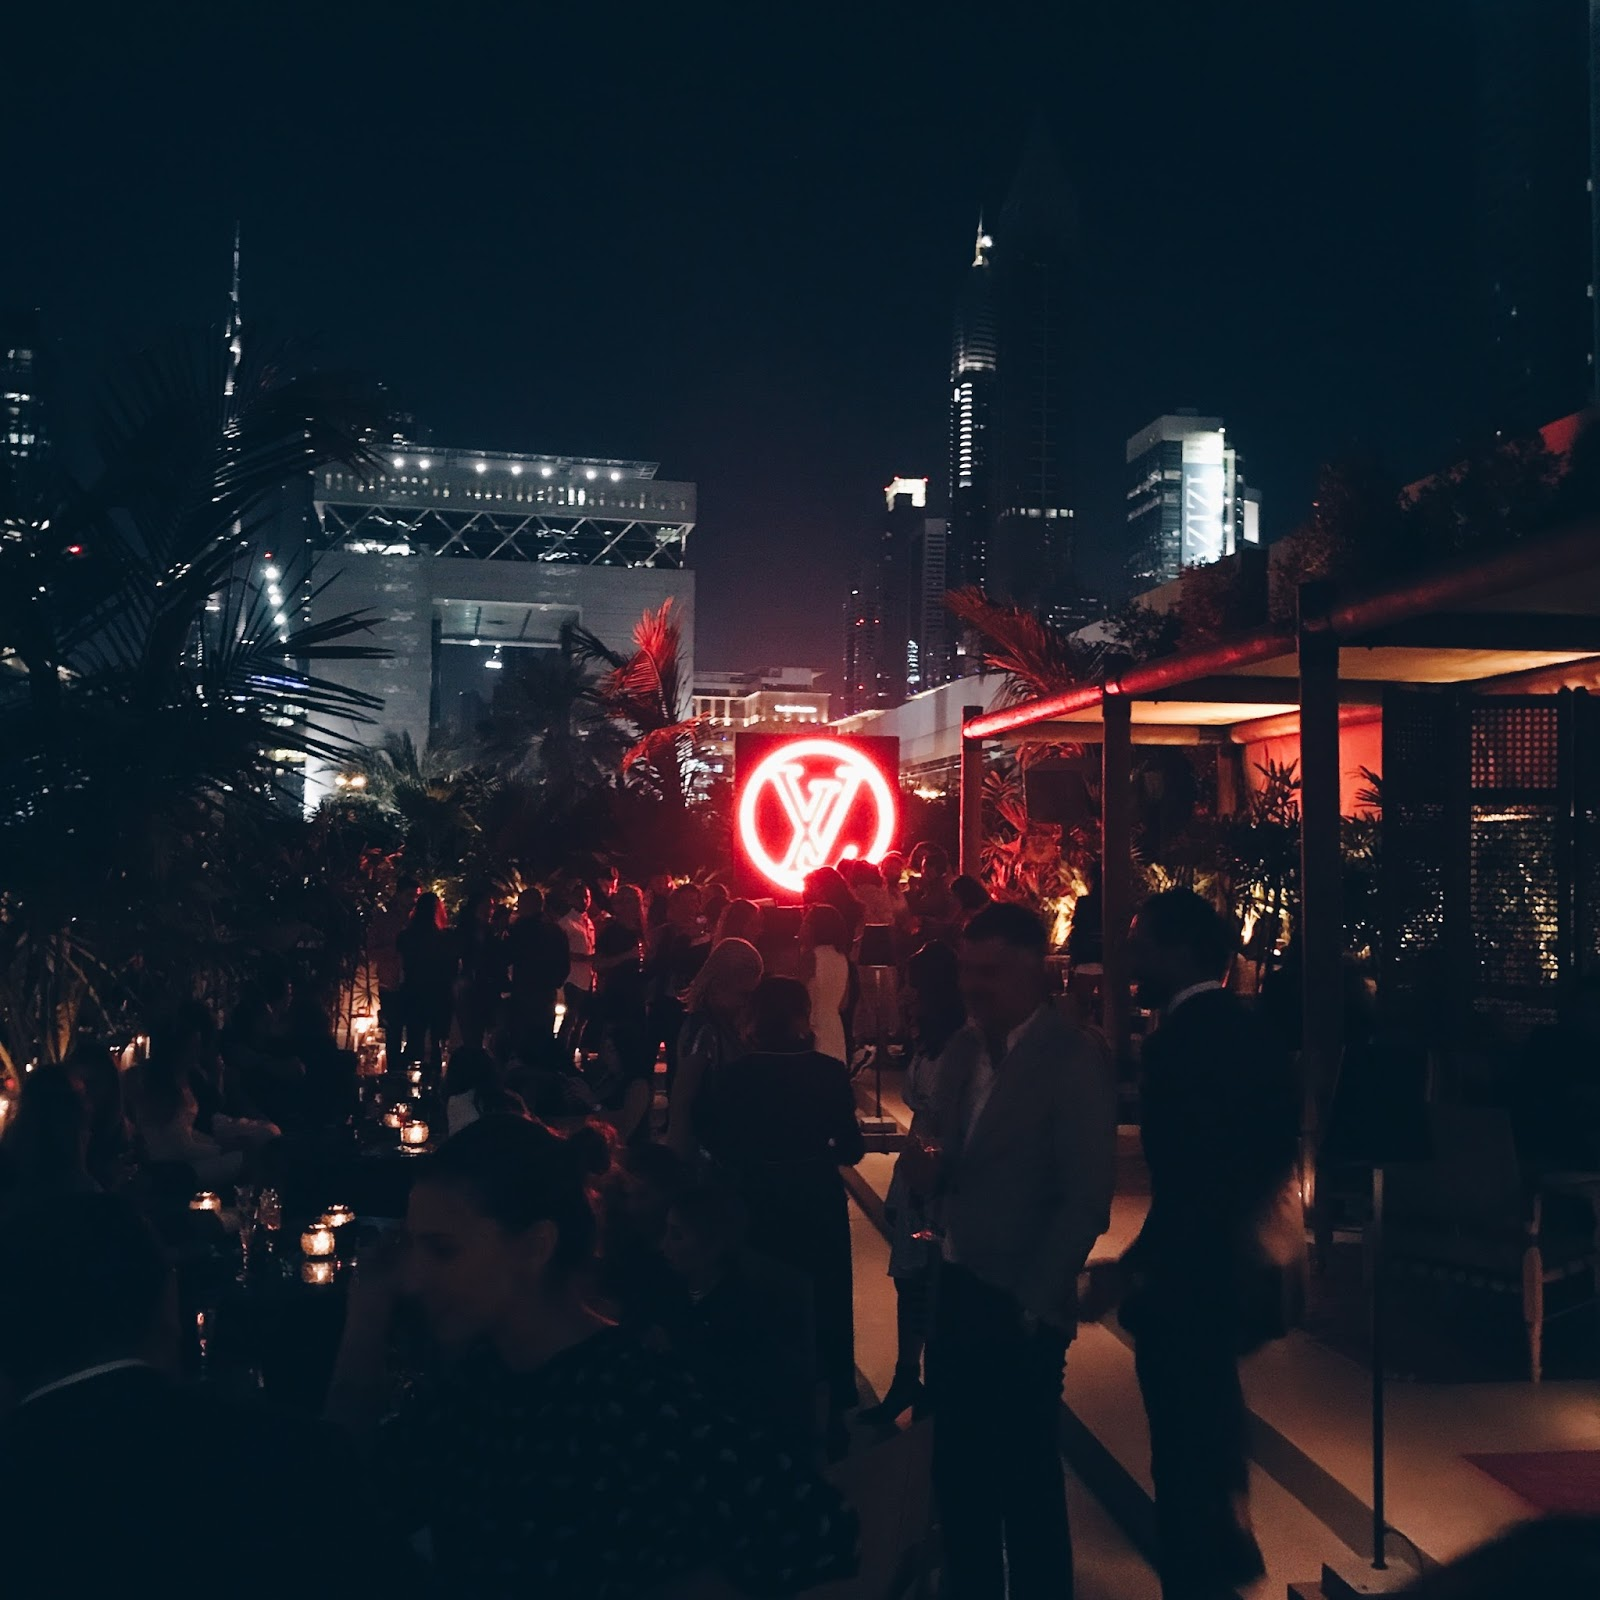 3ef59a709 New Vlog:Louis Vuitton Time Capsule Exhbition in Dubai | WalaHearts ...